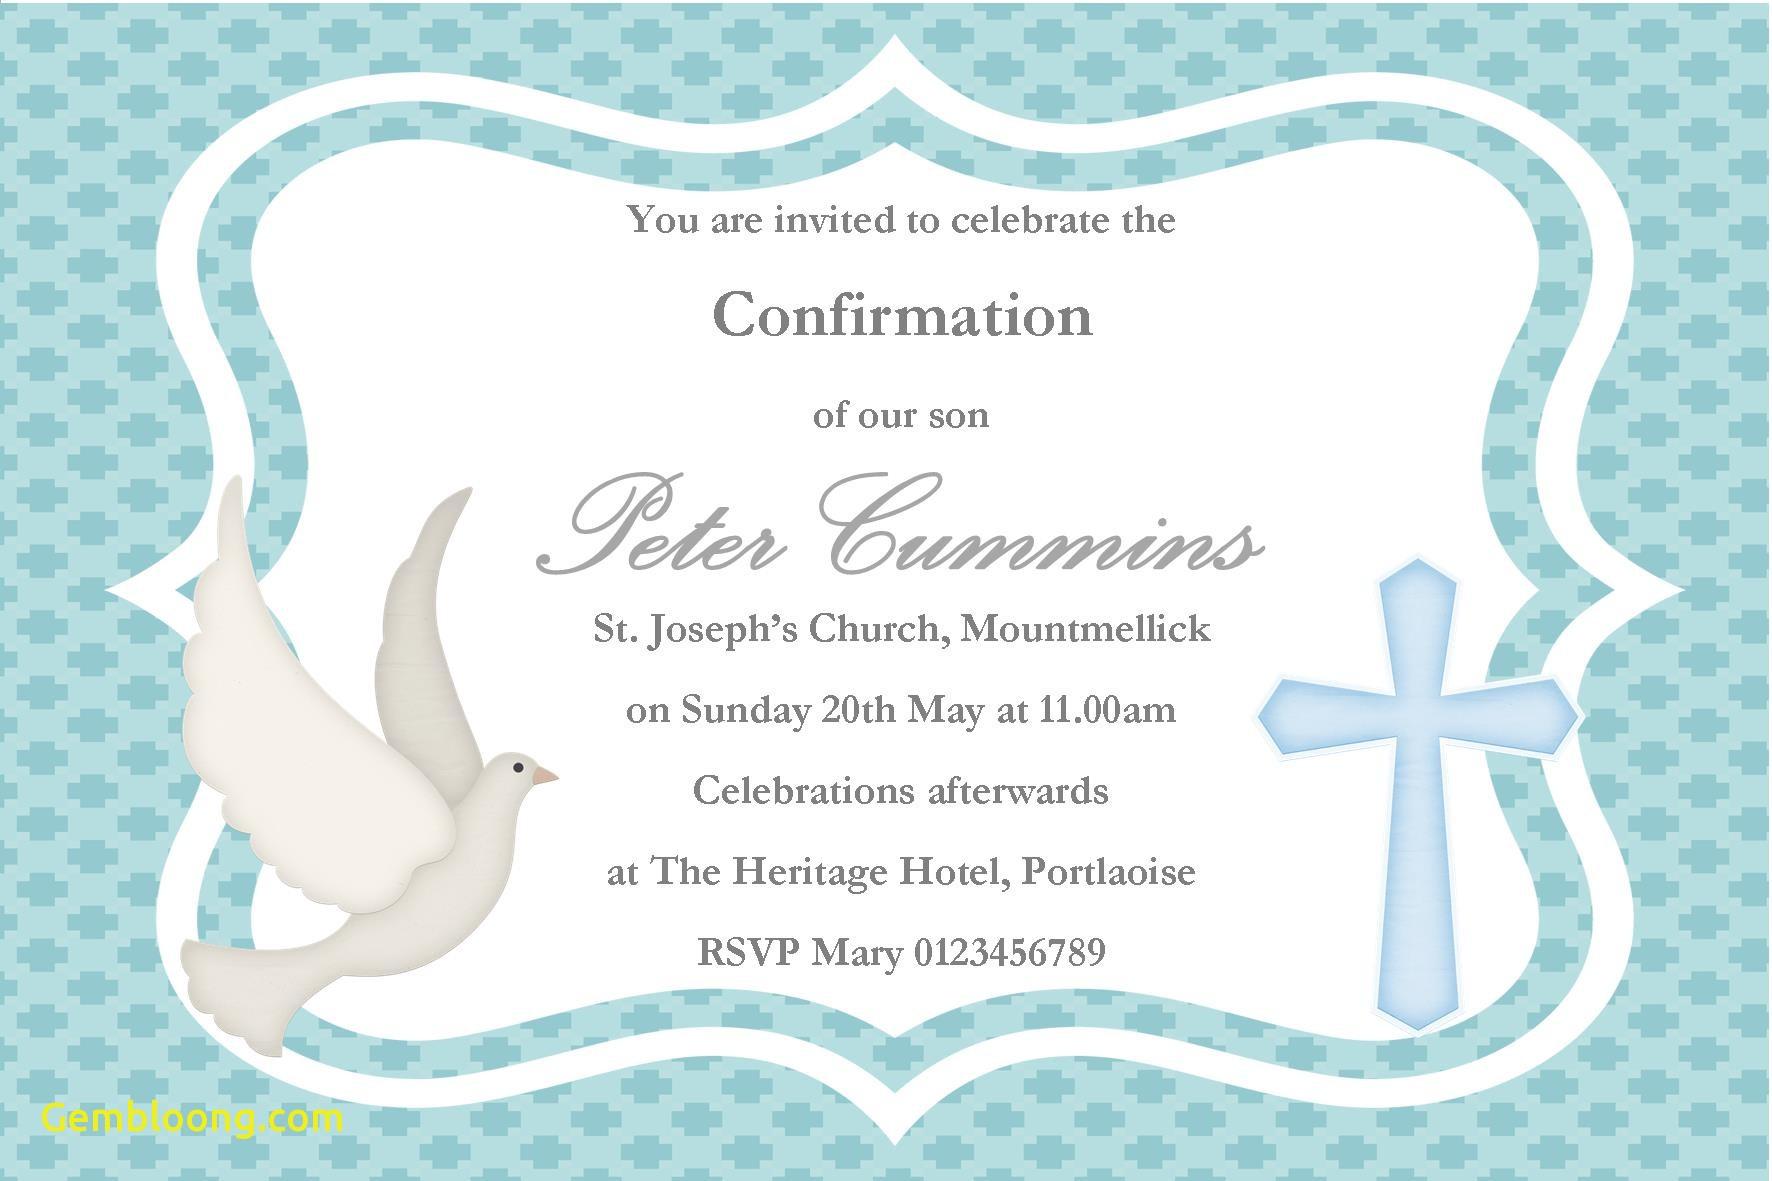 First Communion Invitation Templates Fresh Invitation Template Free - Free Printable First Communion Invitation Templates